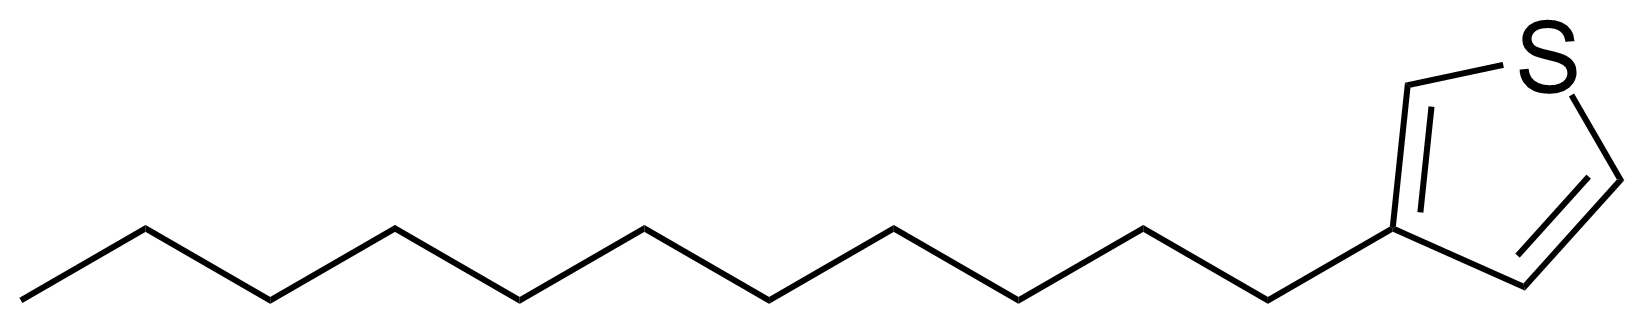 Structure of 3-Undecylthiophene